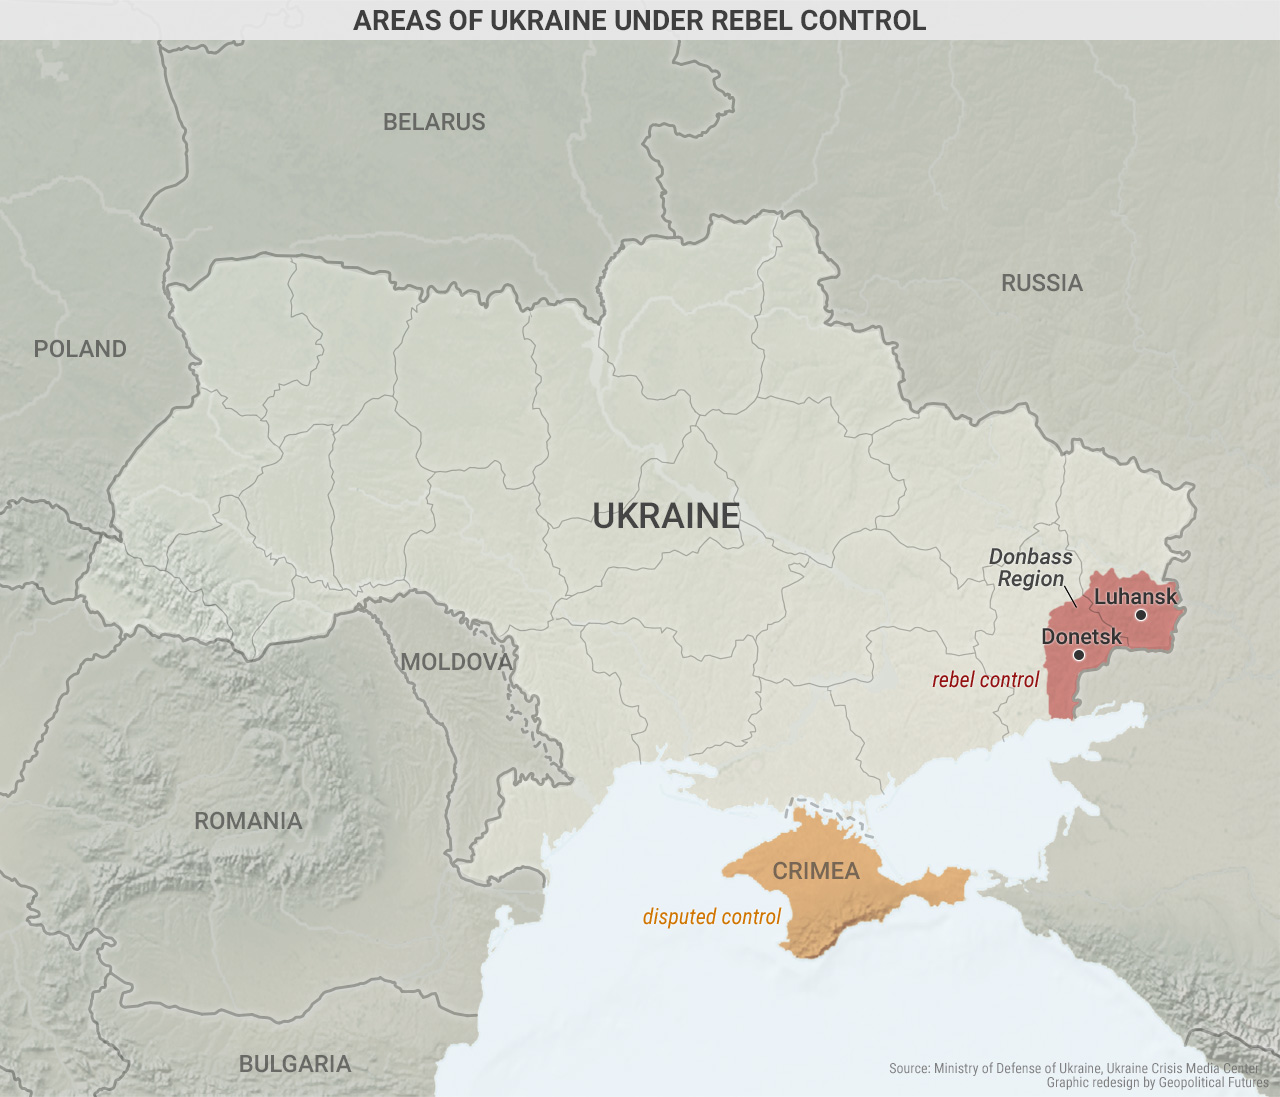 2016-rebel-control-ukraine